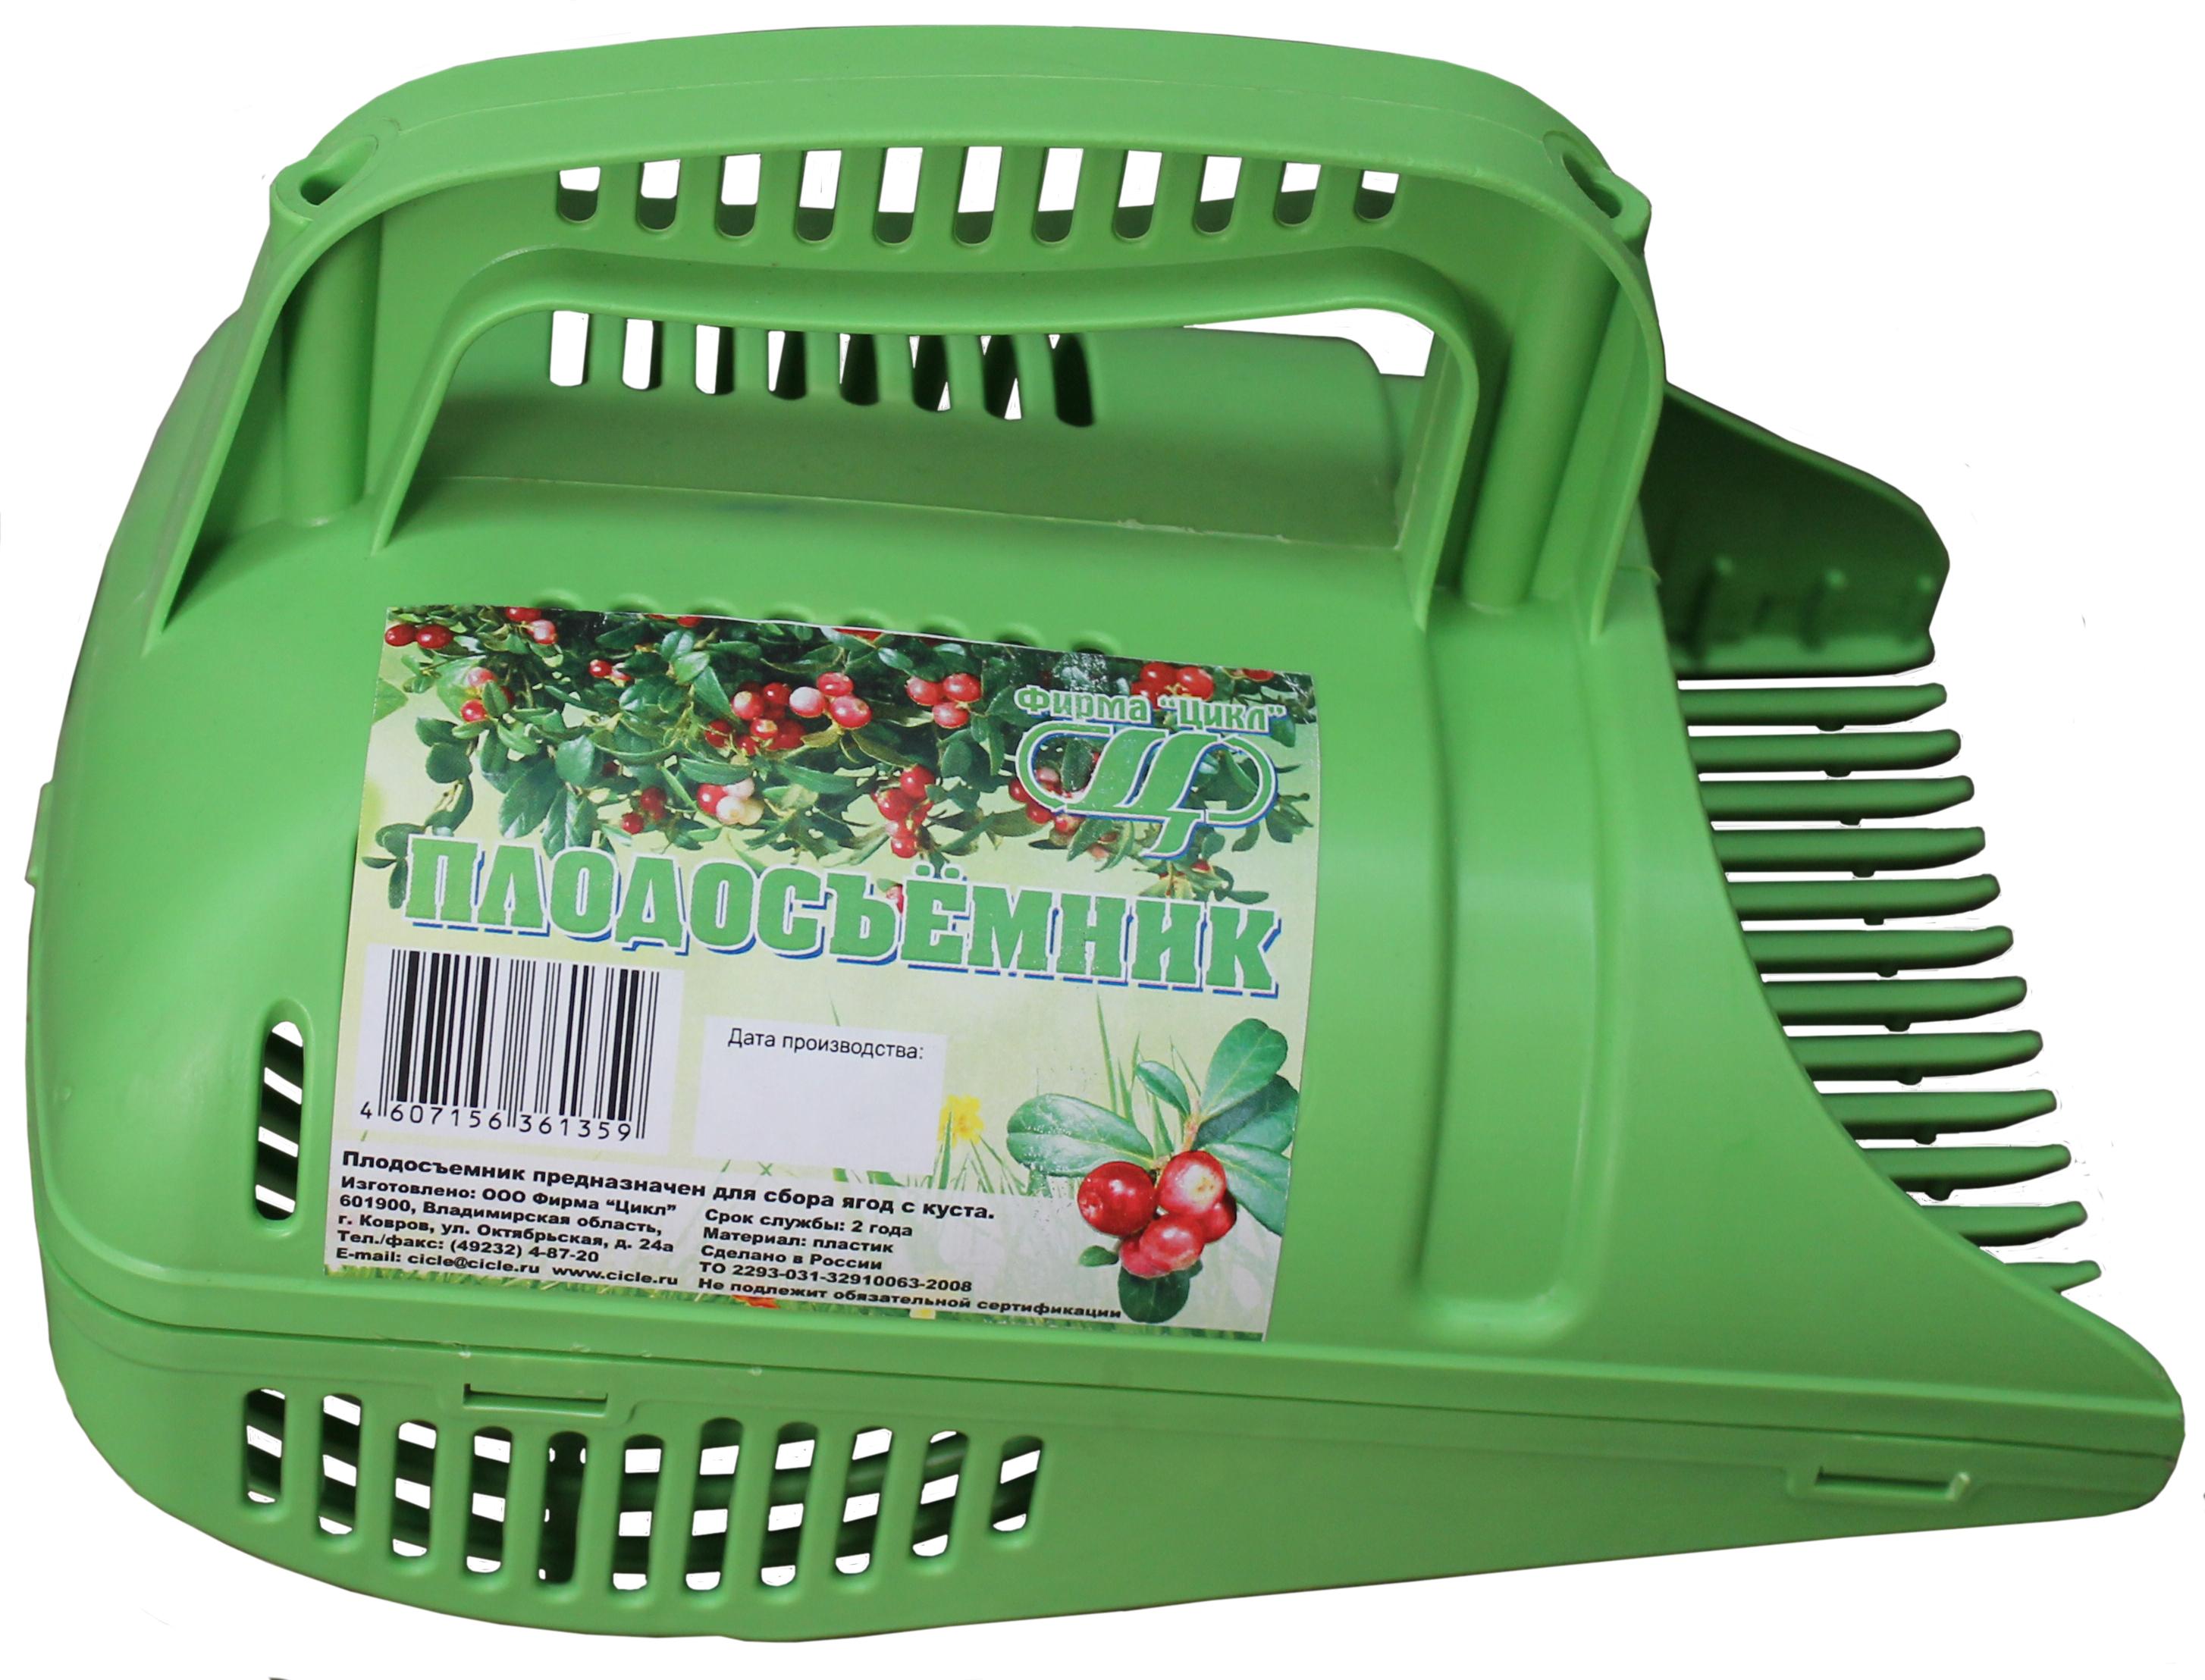 Плодосъемник для ягод